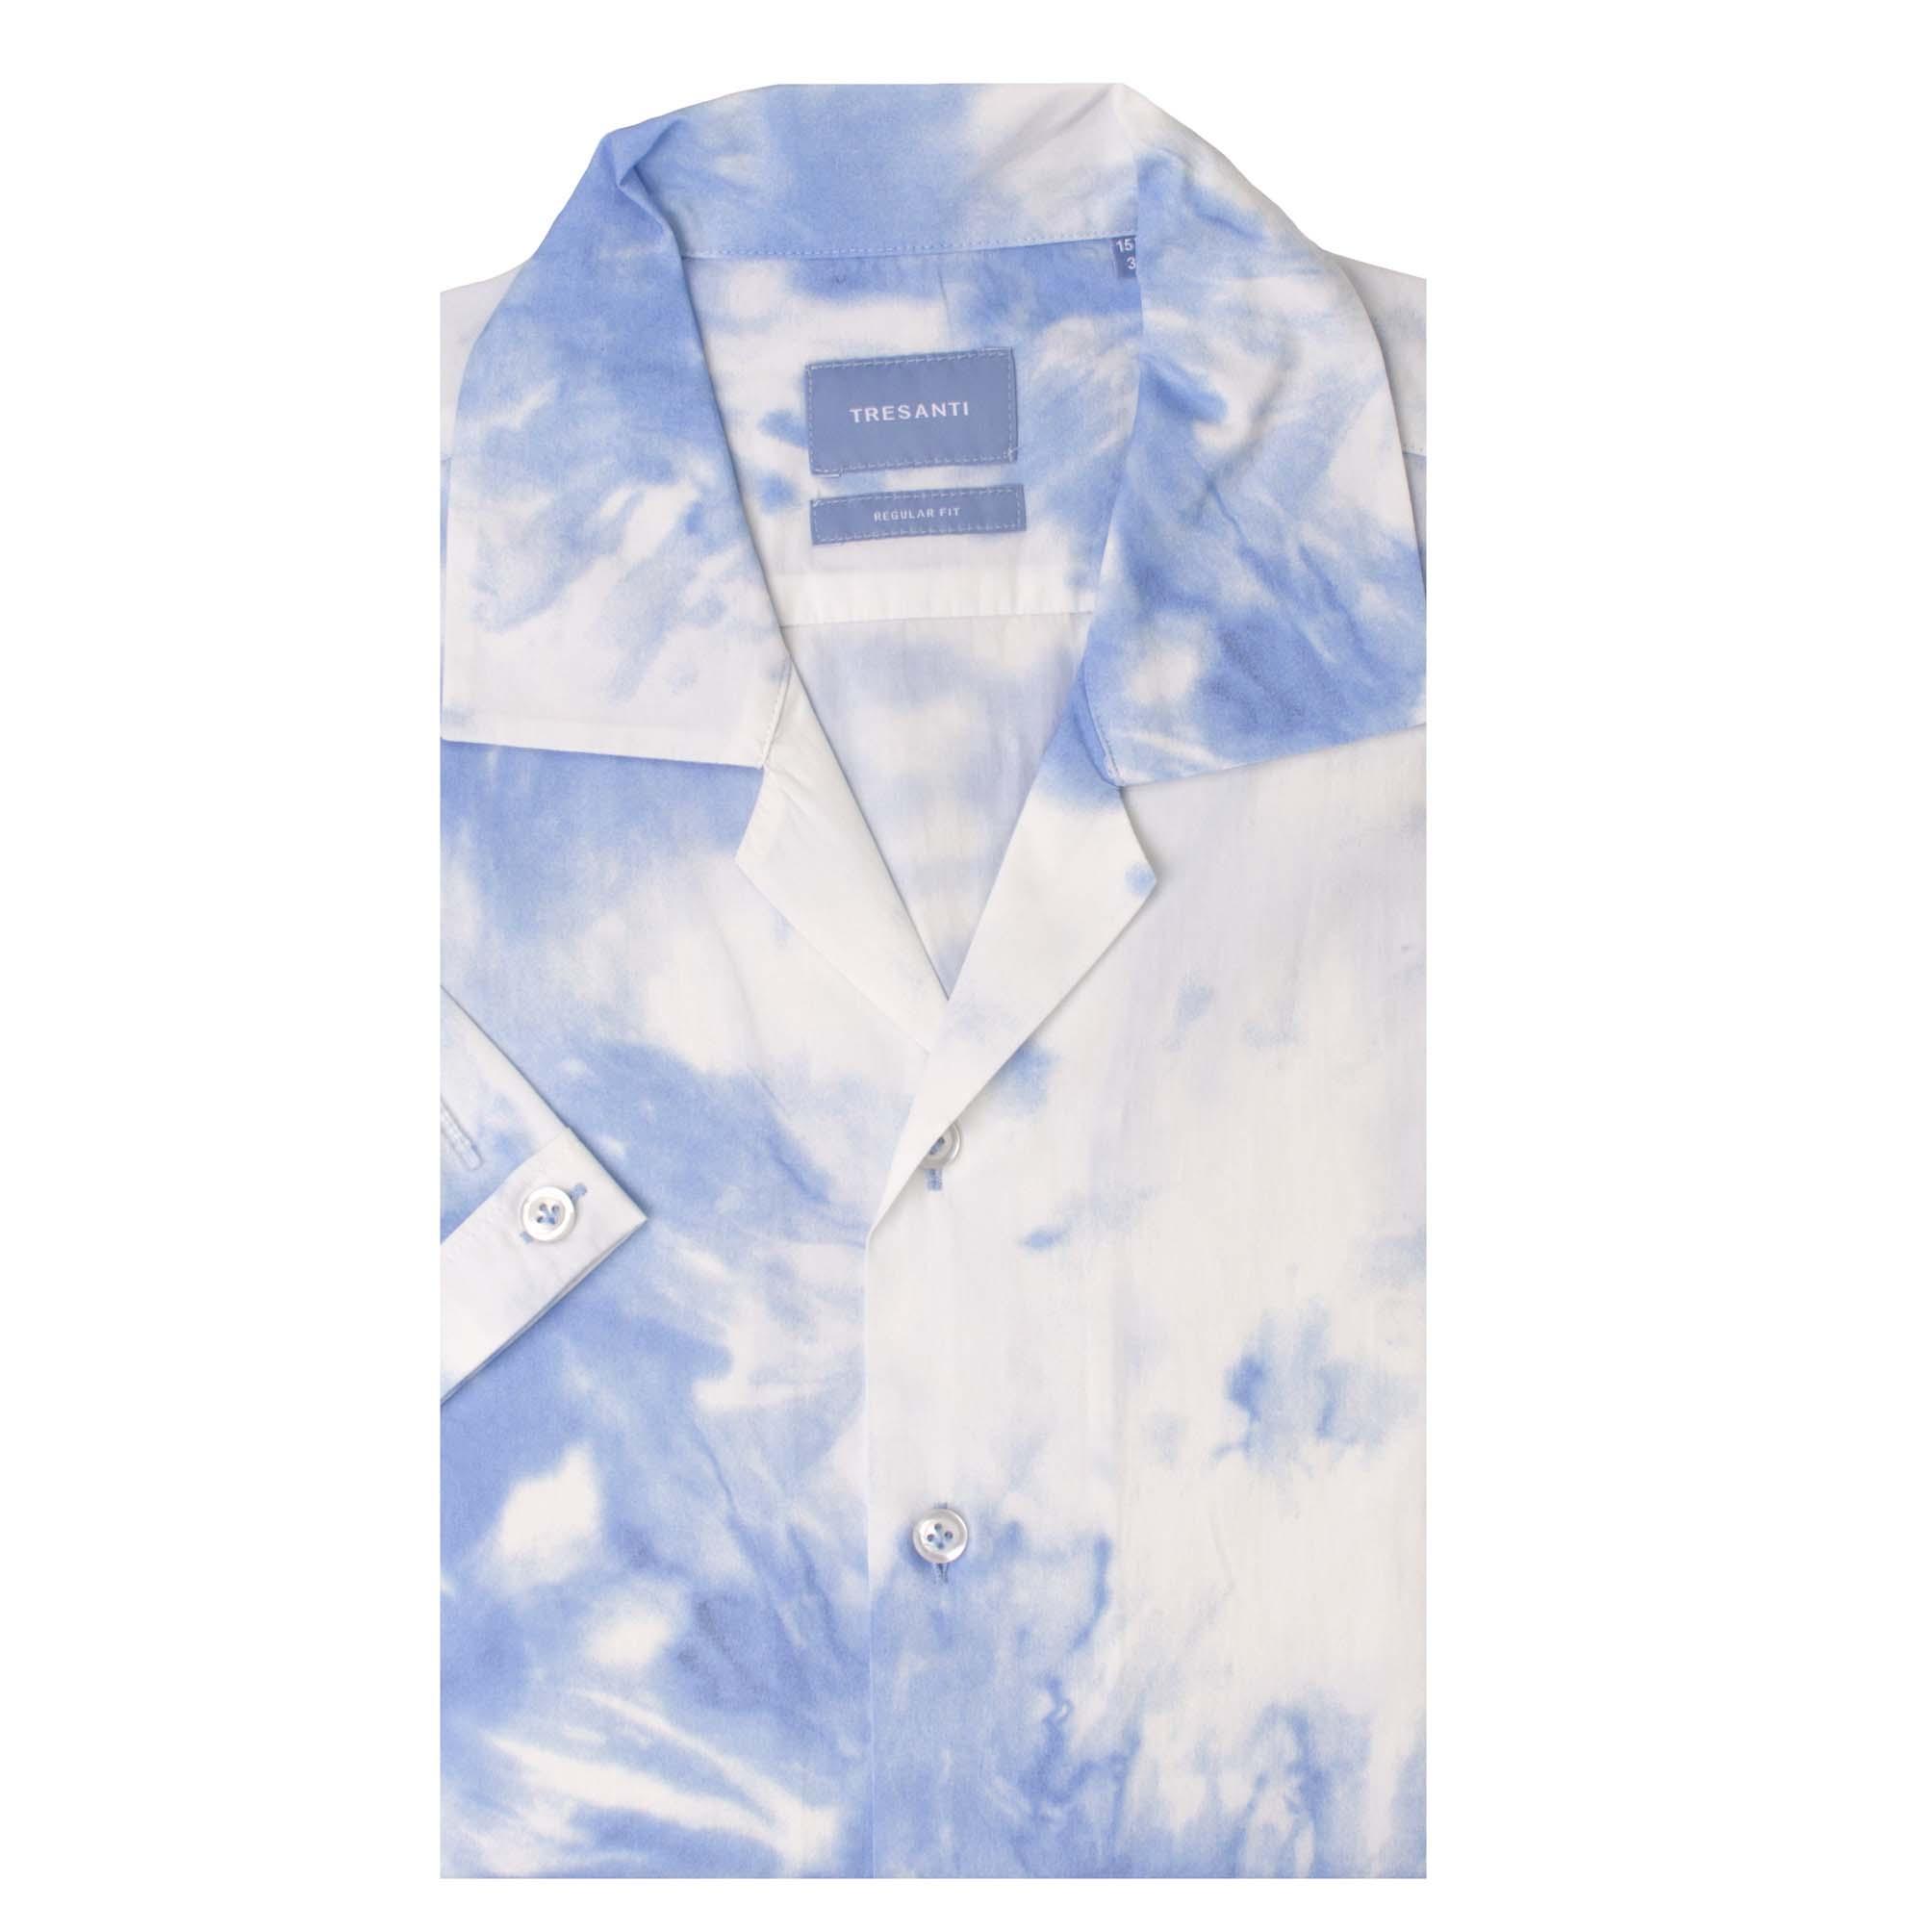 Tyrell | Shirt tie dye print blue | SS